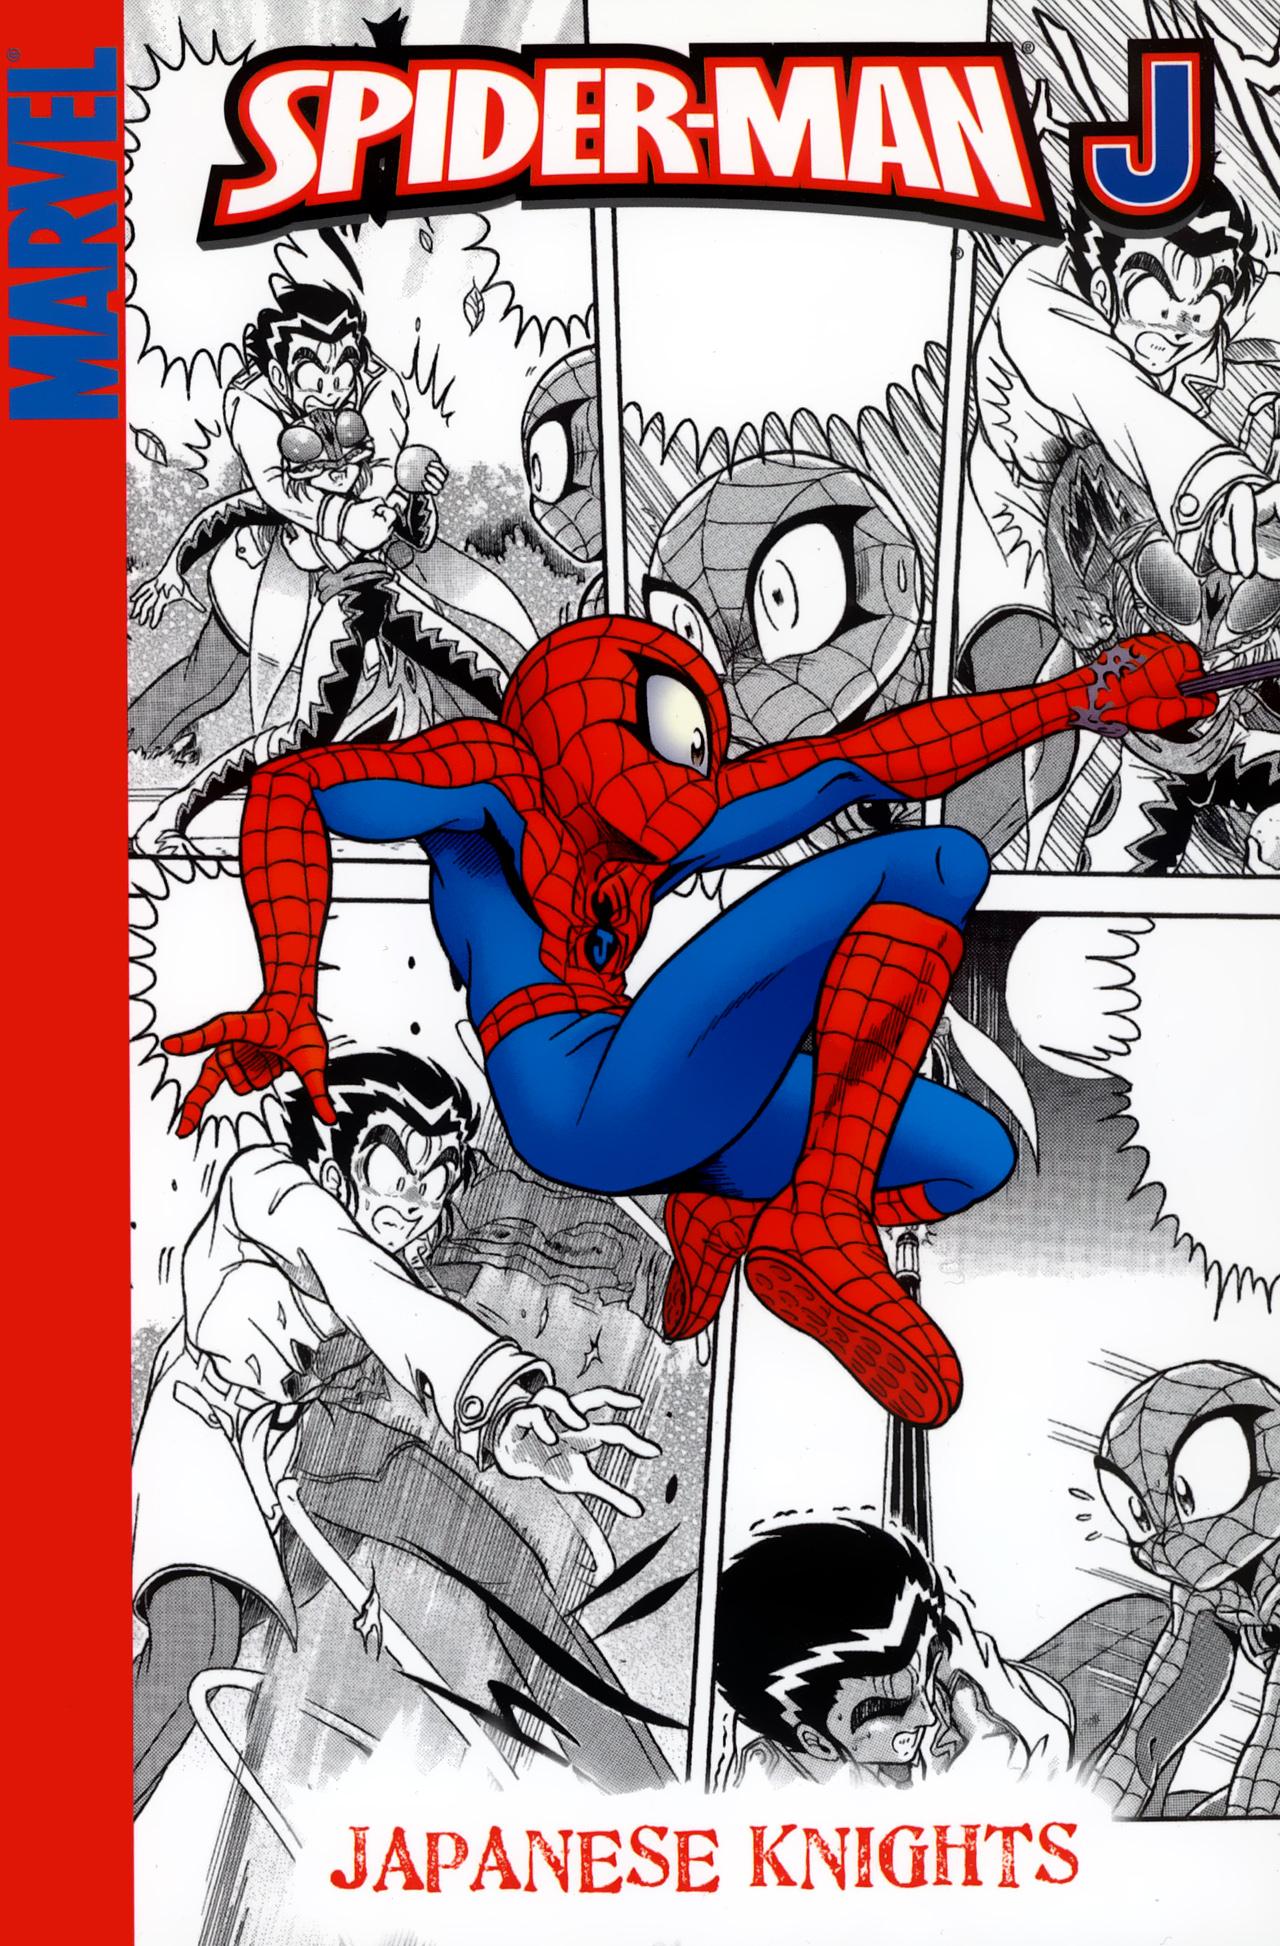 Spider-Man J TPB_1 Page 1